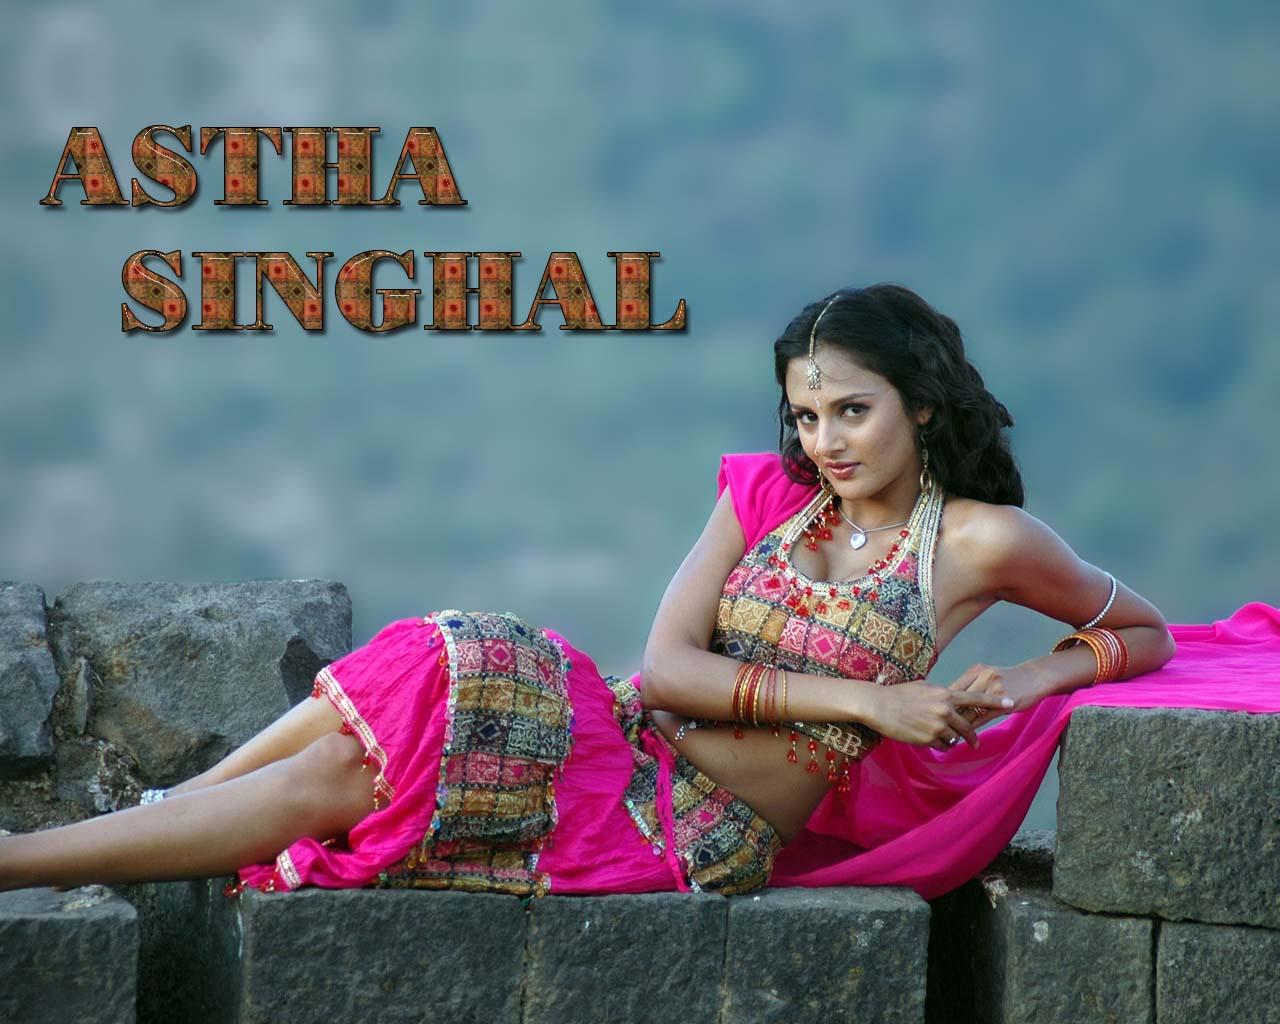 http://1.bp.blogspot.com/-fzVkHpUjHnc/T83q-LD4hcI/AAAAAAAAGkk/iagxNPDBlnQ/s1600/astha-singhal-a-pictures.jpg